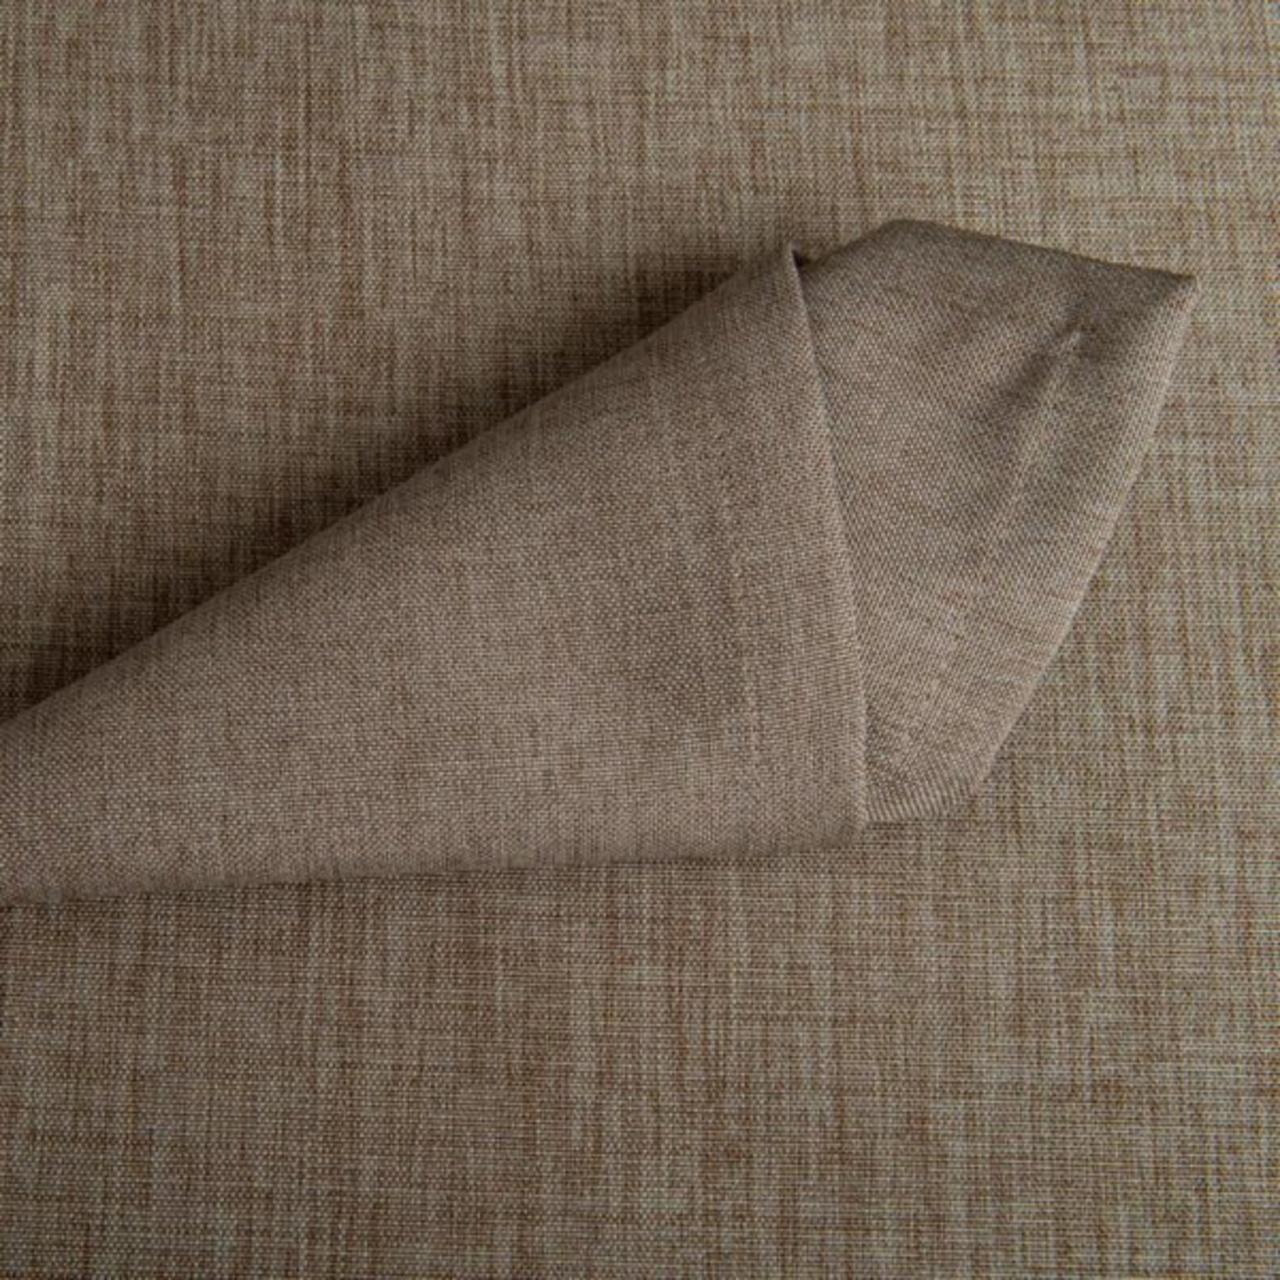 Linge De Table Saumur Noisette Polyester 286 Grs M2 Professionnel Restaurant Linvosges Hotellerie